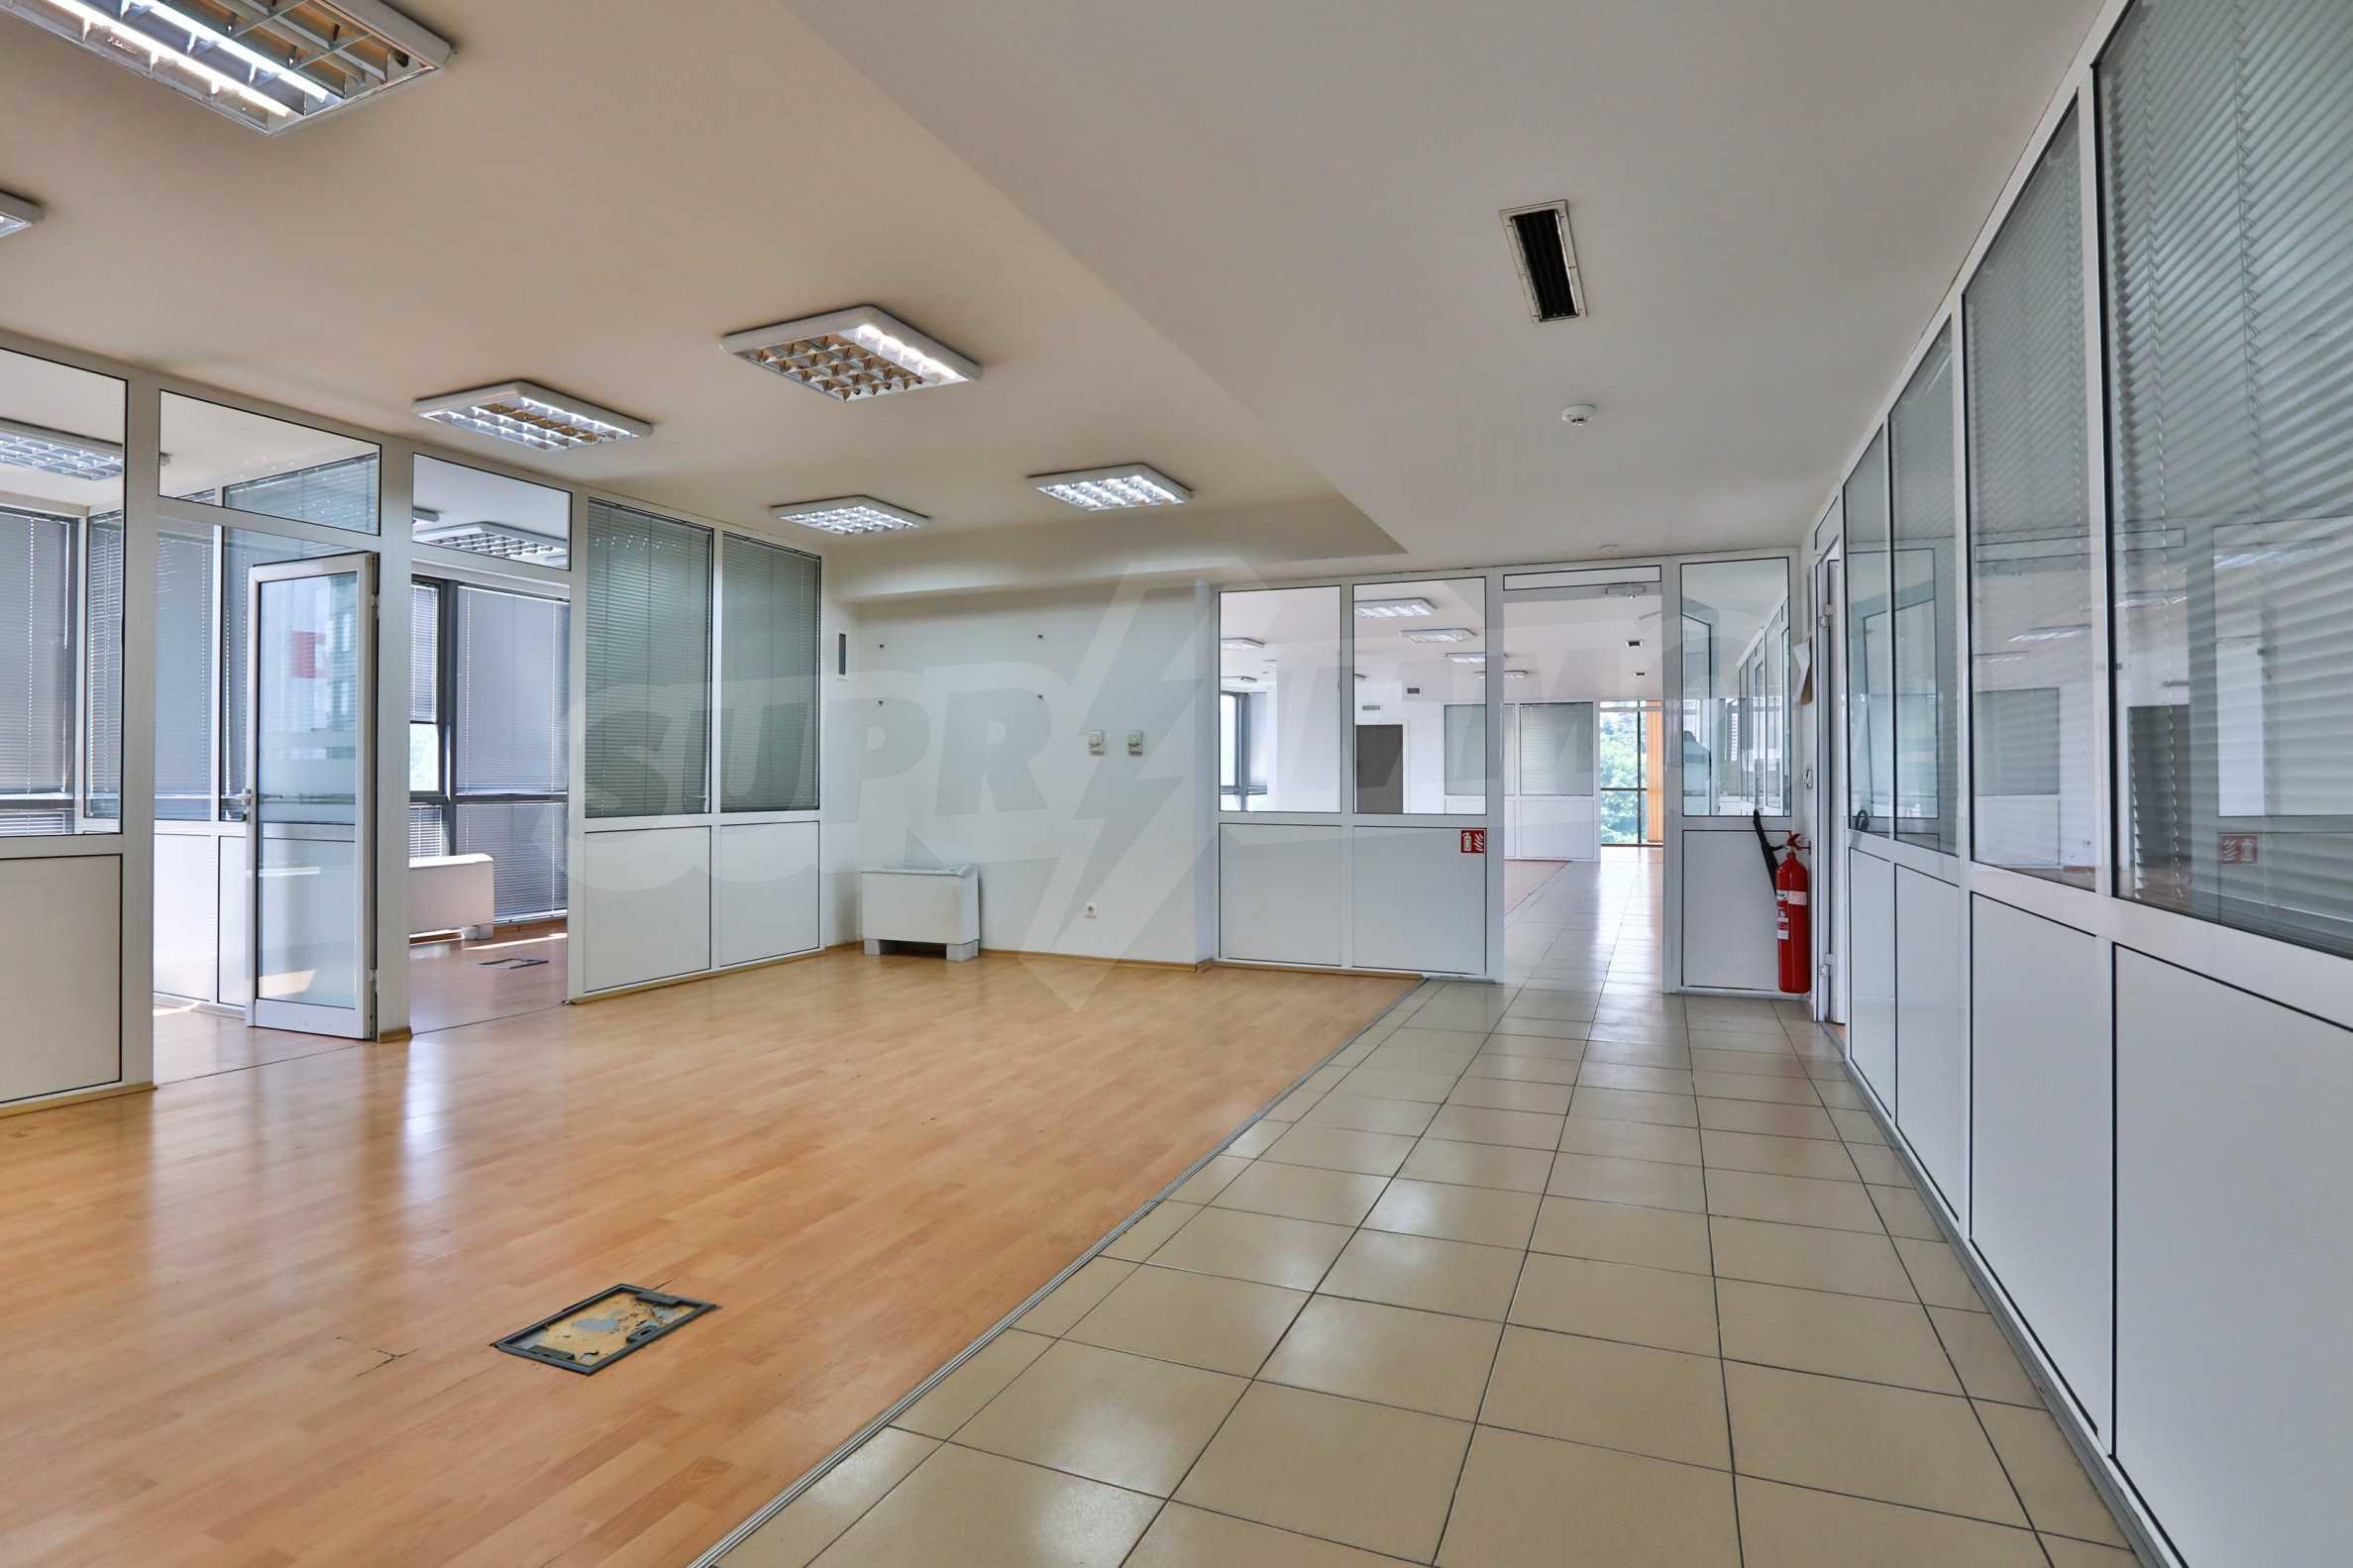 Офис в бизнес сграда висок клас на бул. Цариградско шосе 20